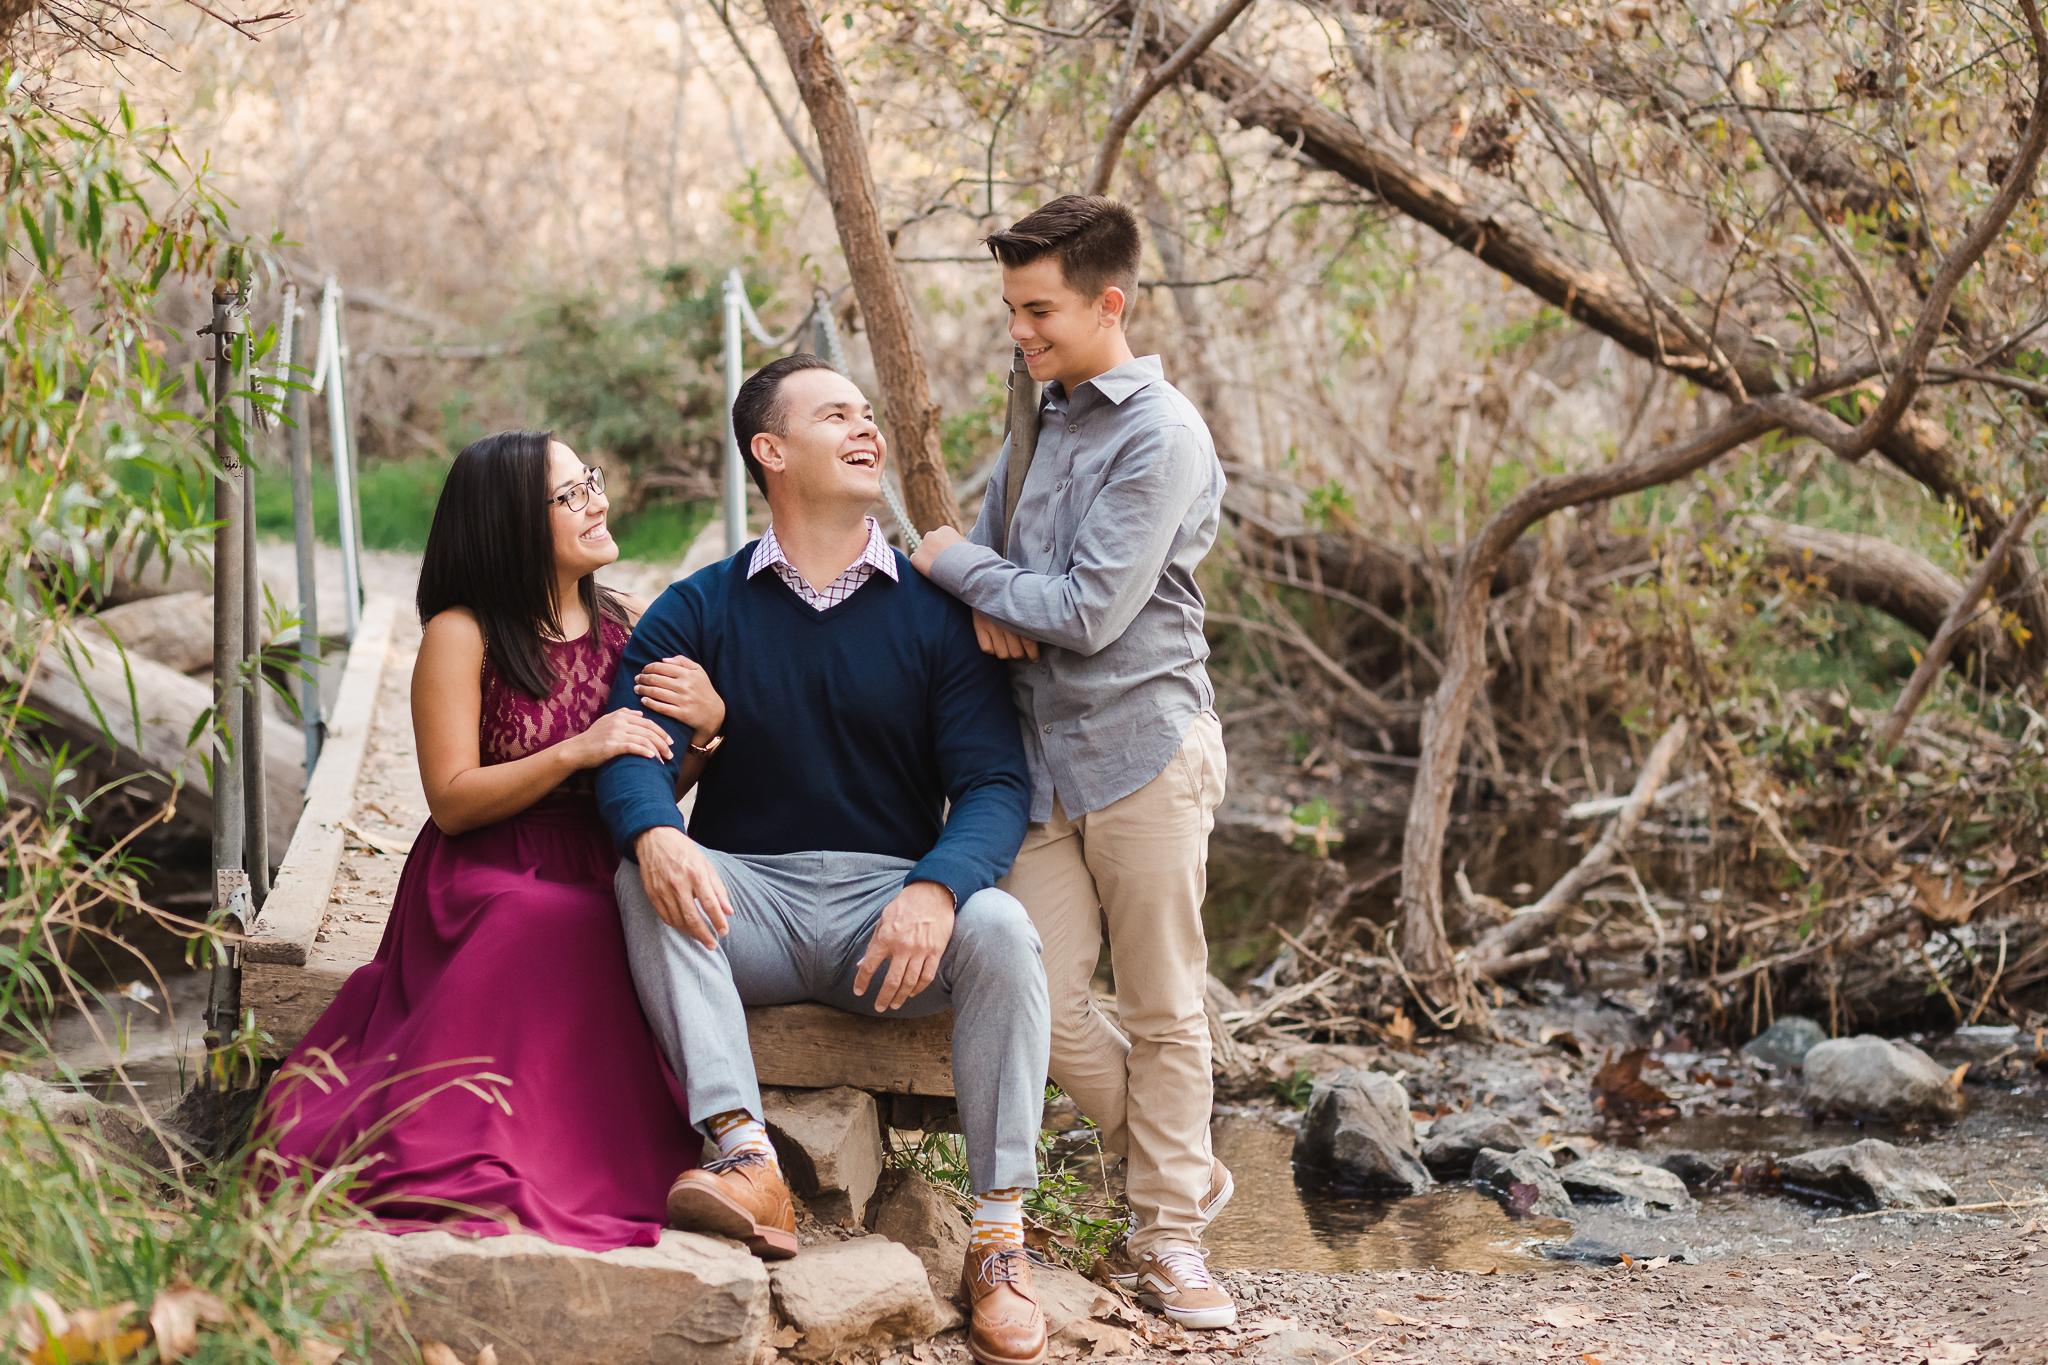 Family photos at Los Penasquitos Canyon Preserve | San Diego Family Photographer Christine Dammann